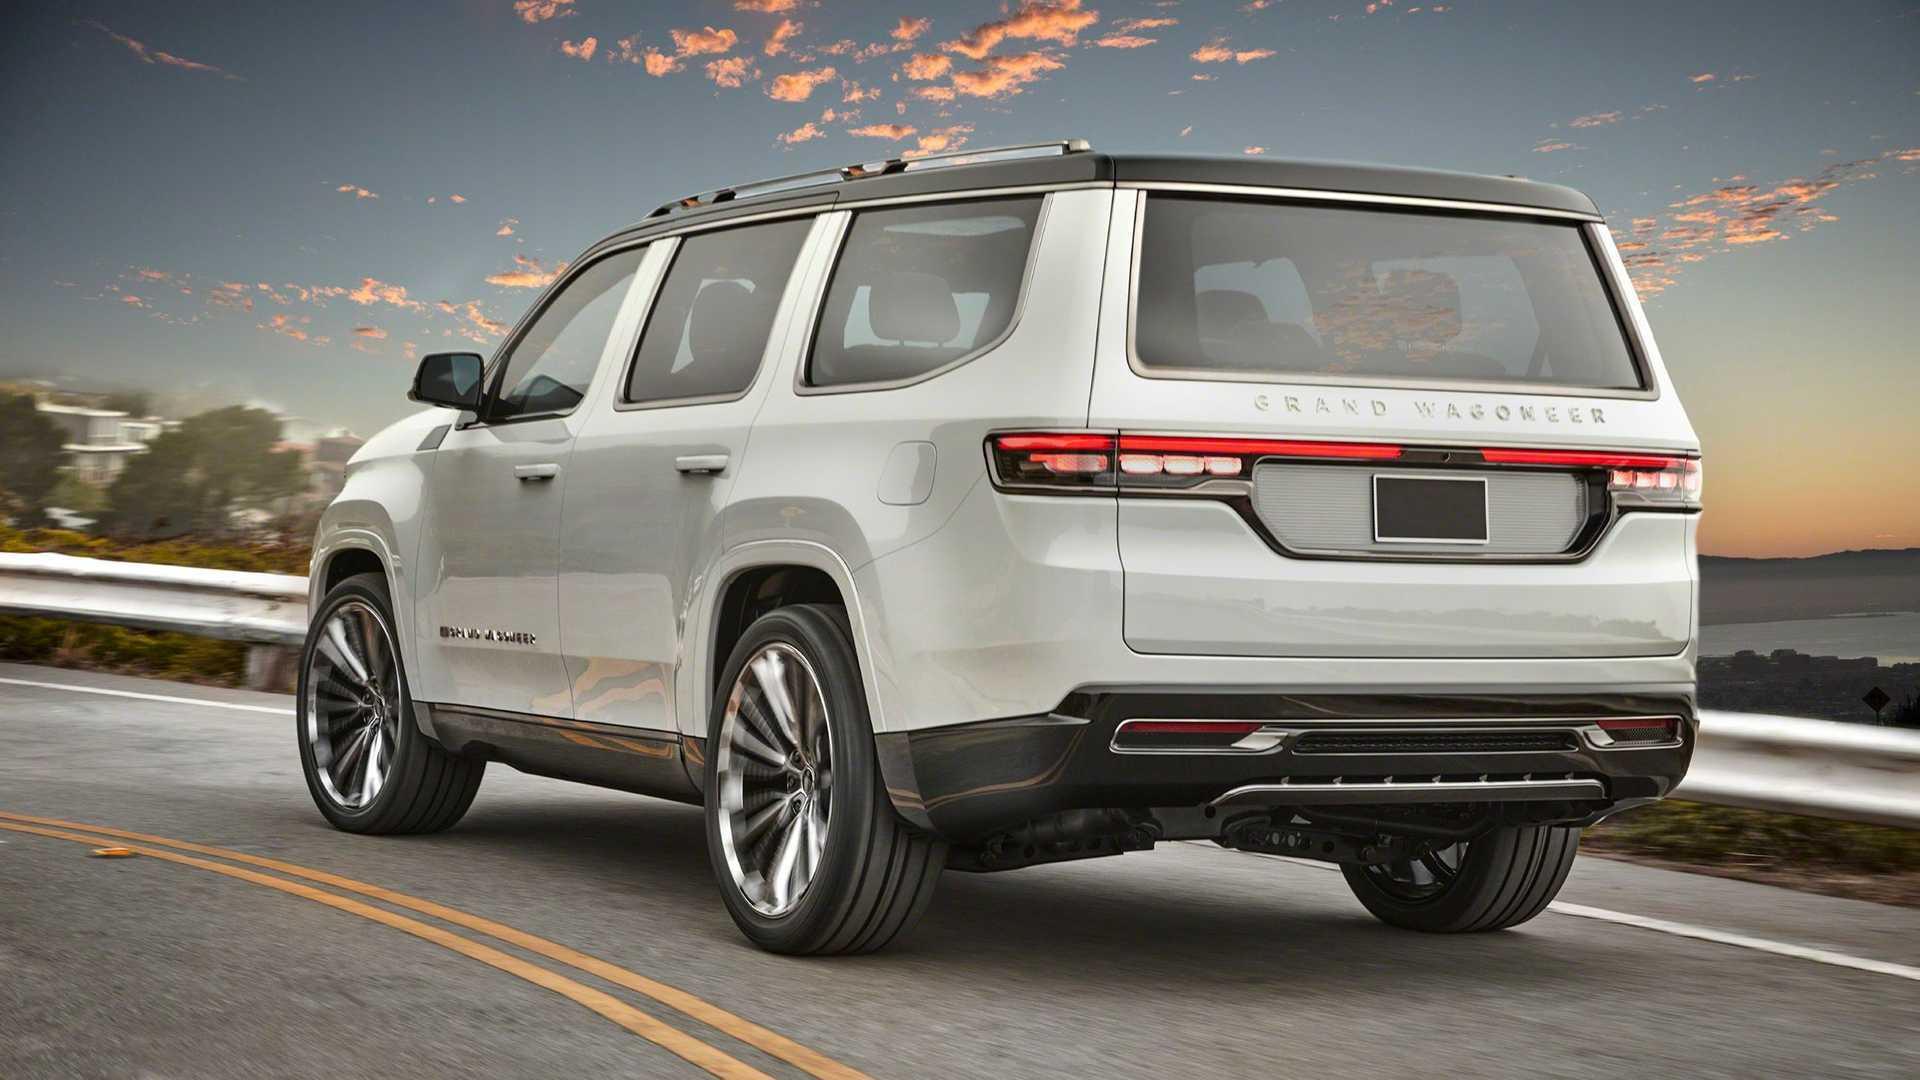 jeep-grand-wagoneer-concept-exterior-02-rear-quarter